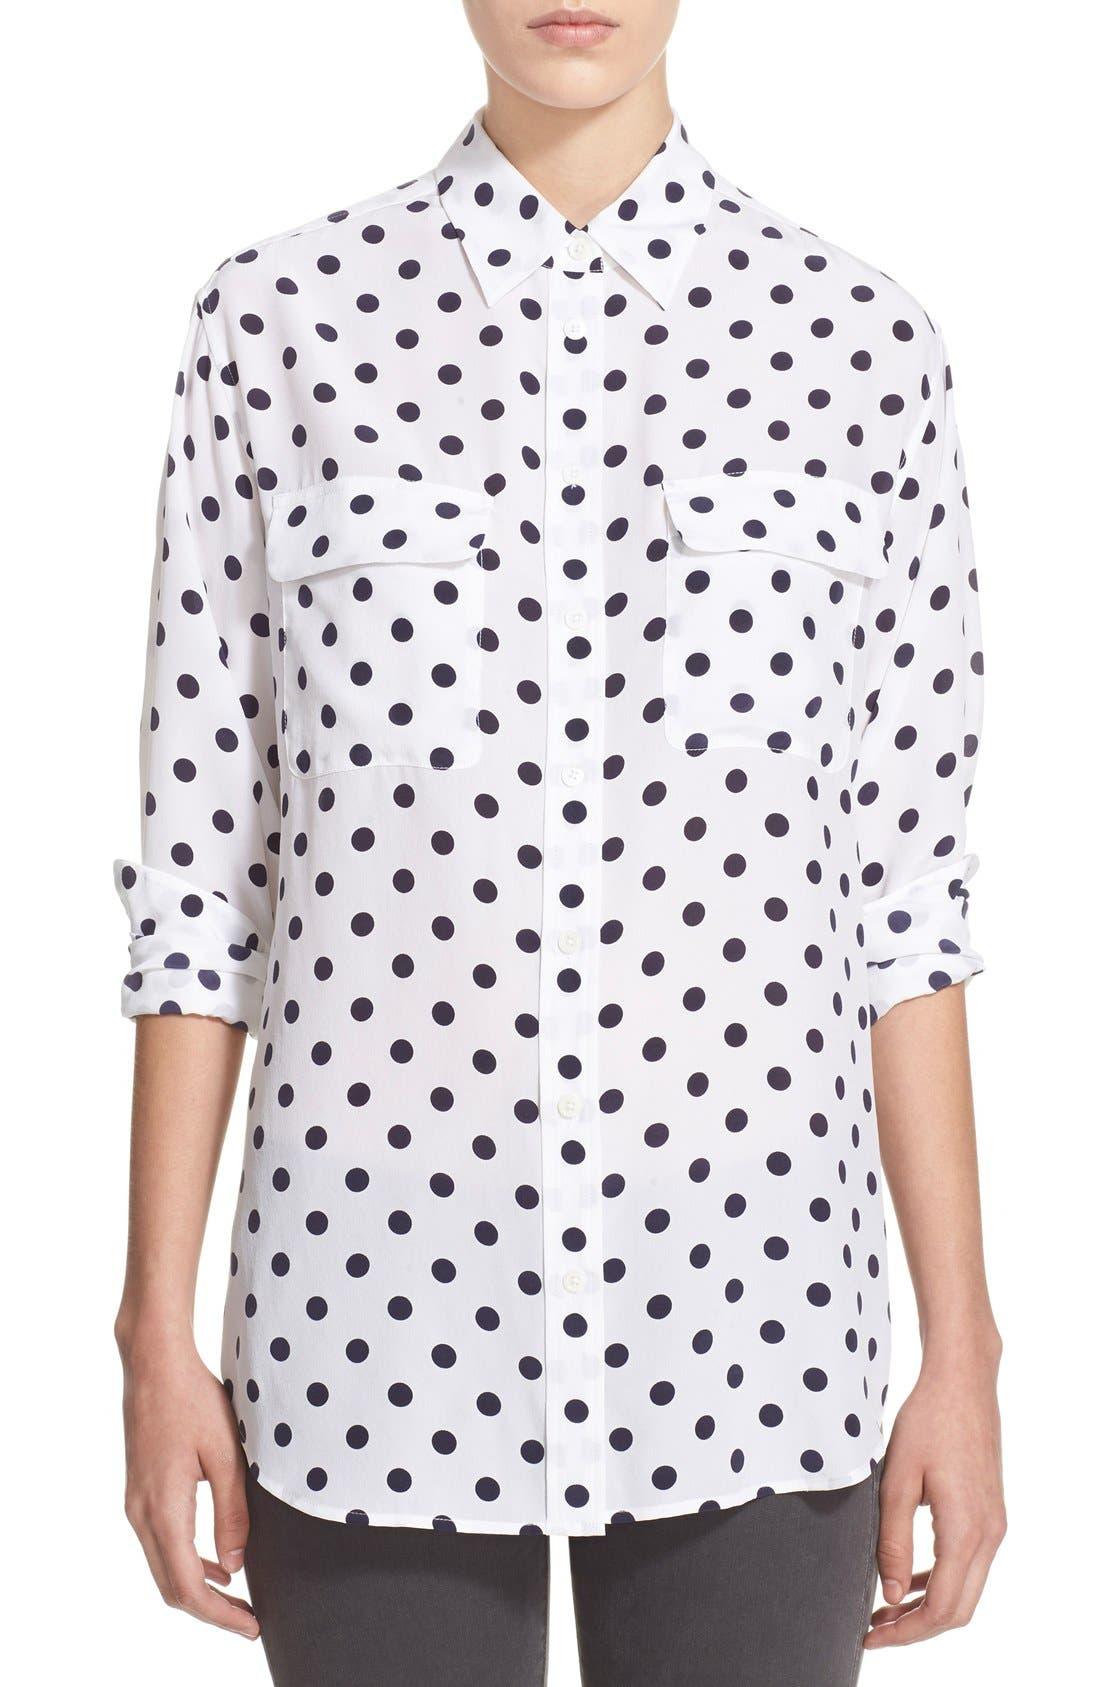 Main Image - Equipment 'Signature' Polka Dot Silk Shirt